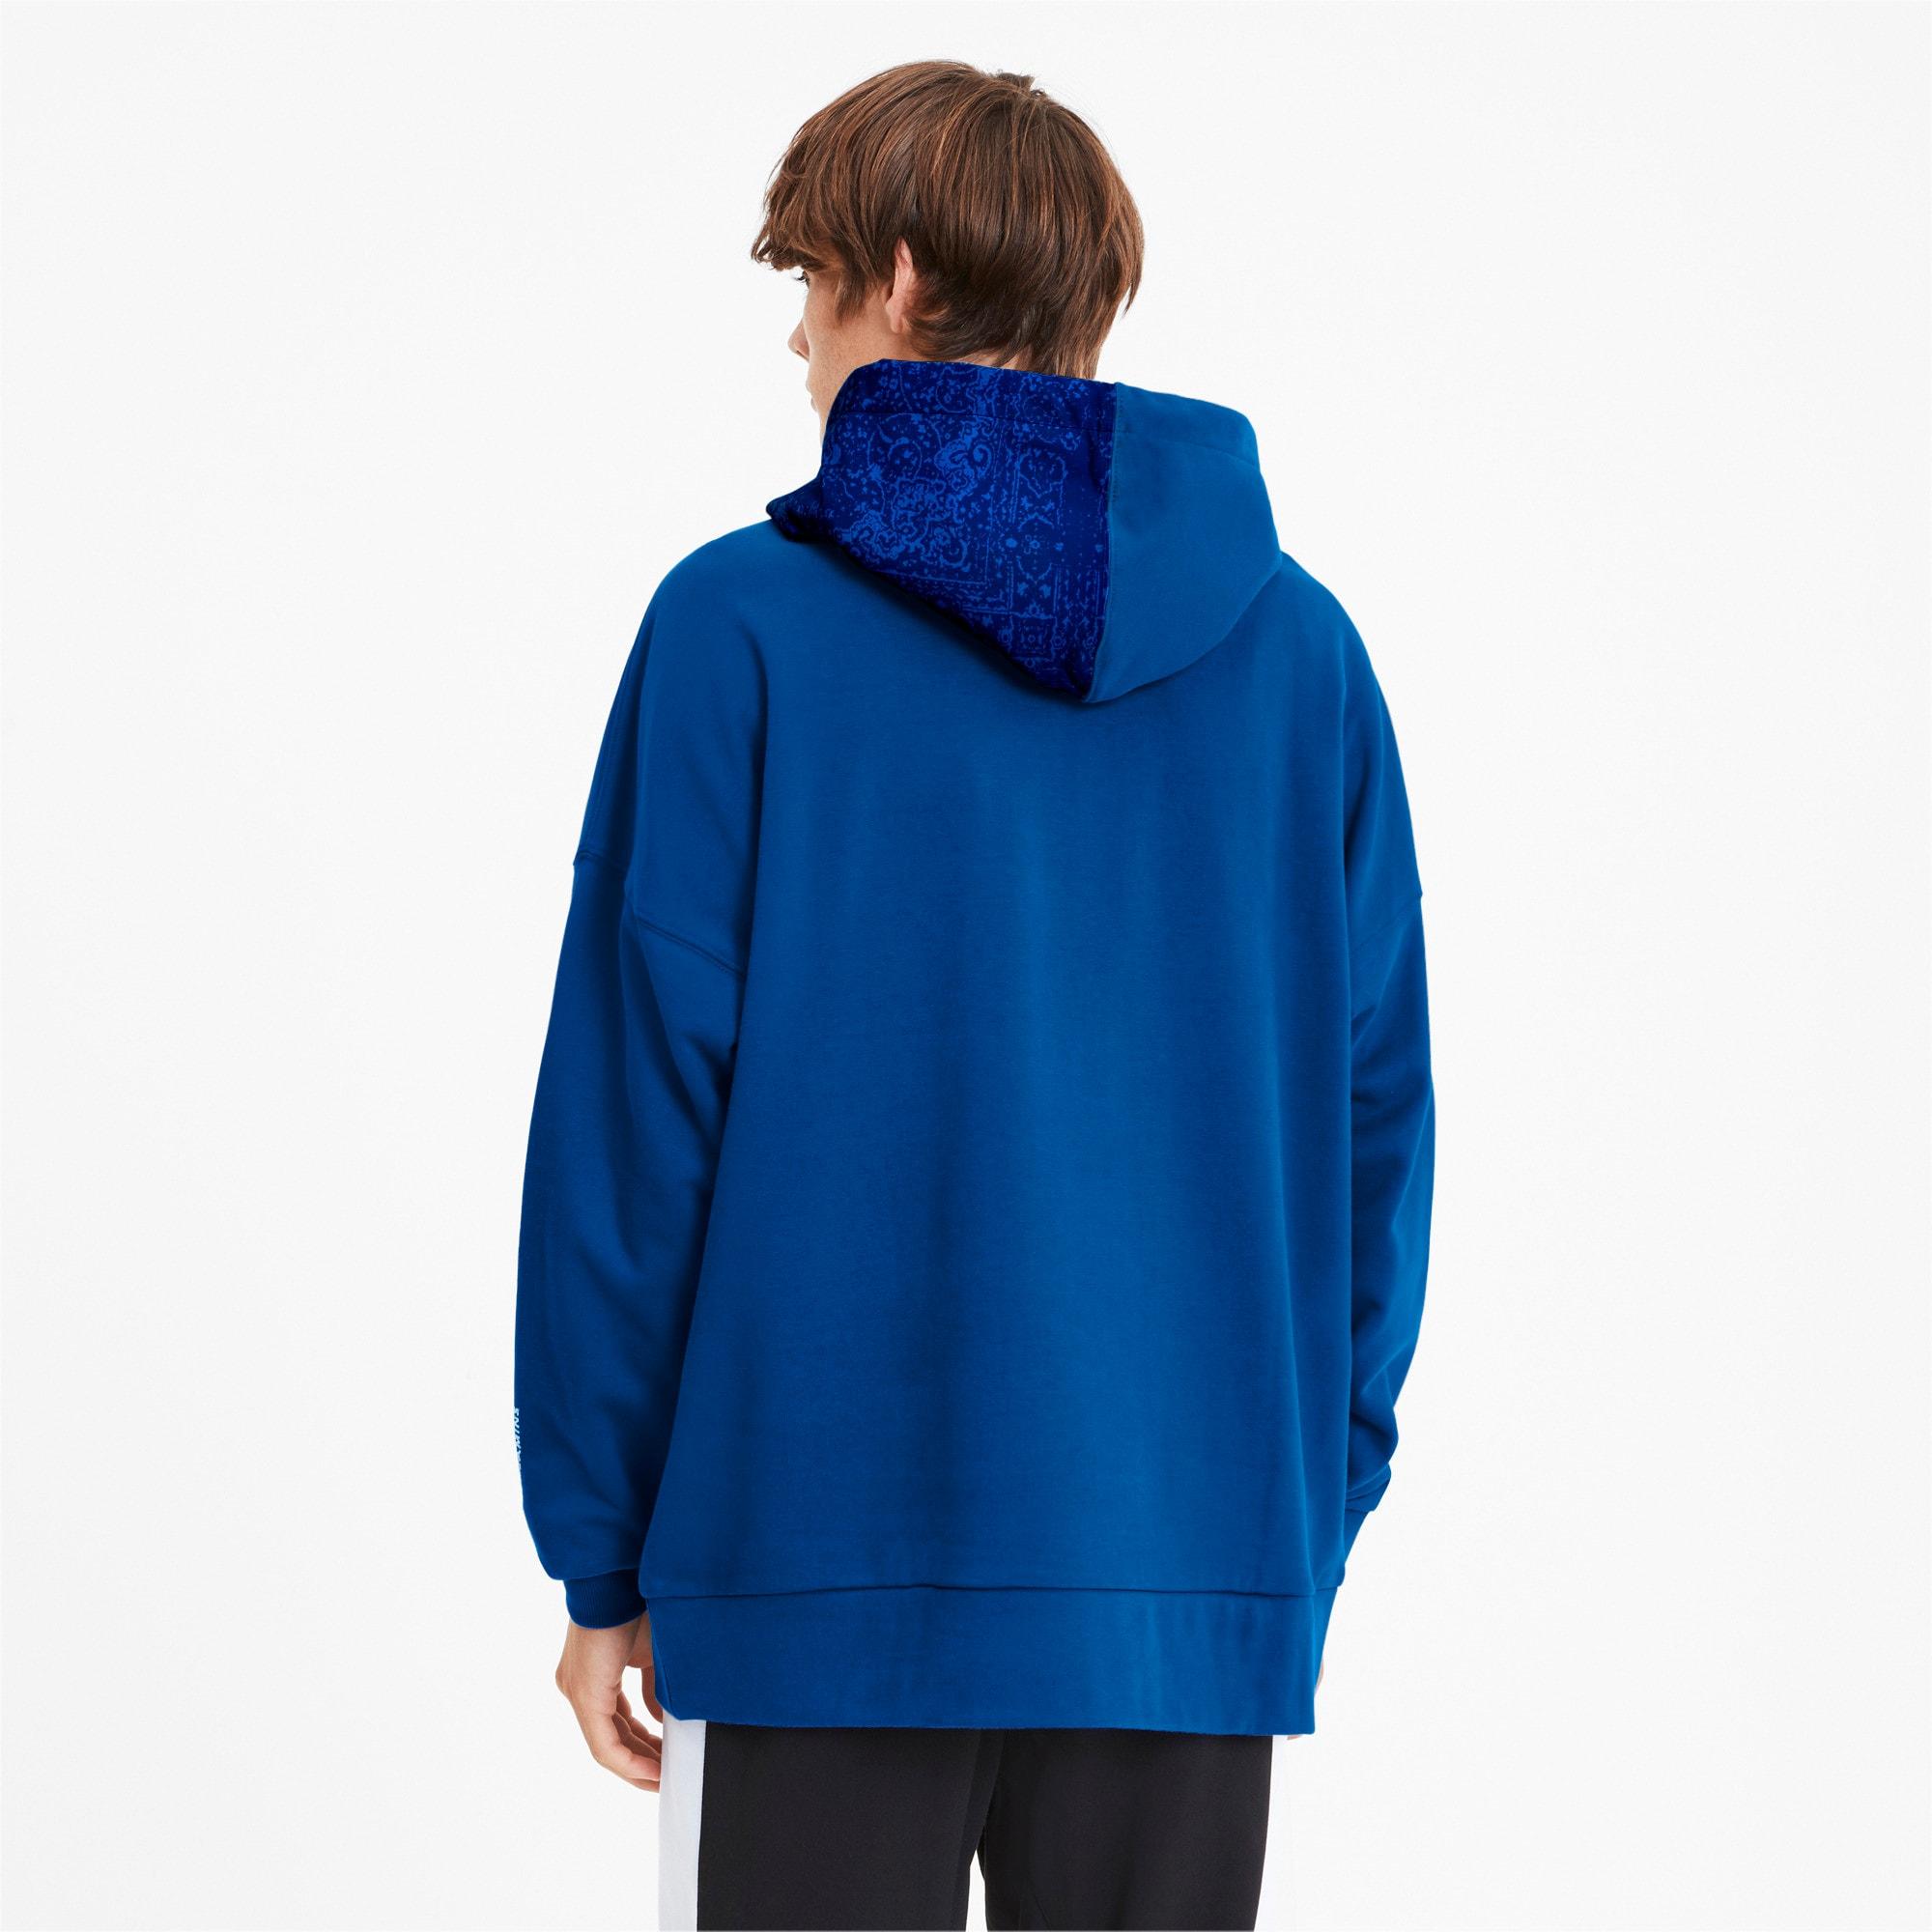 Miniatura 3 de Sudadera con capucha PUMA x LES BENJAMINS para hombre, Galaxy Blue, mediano